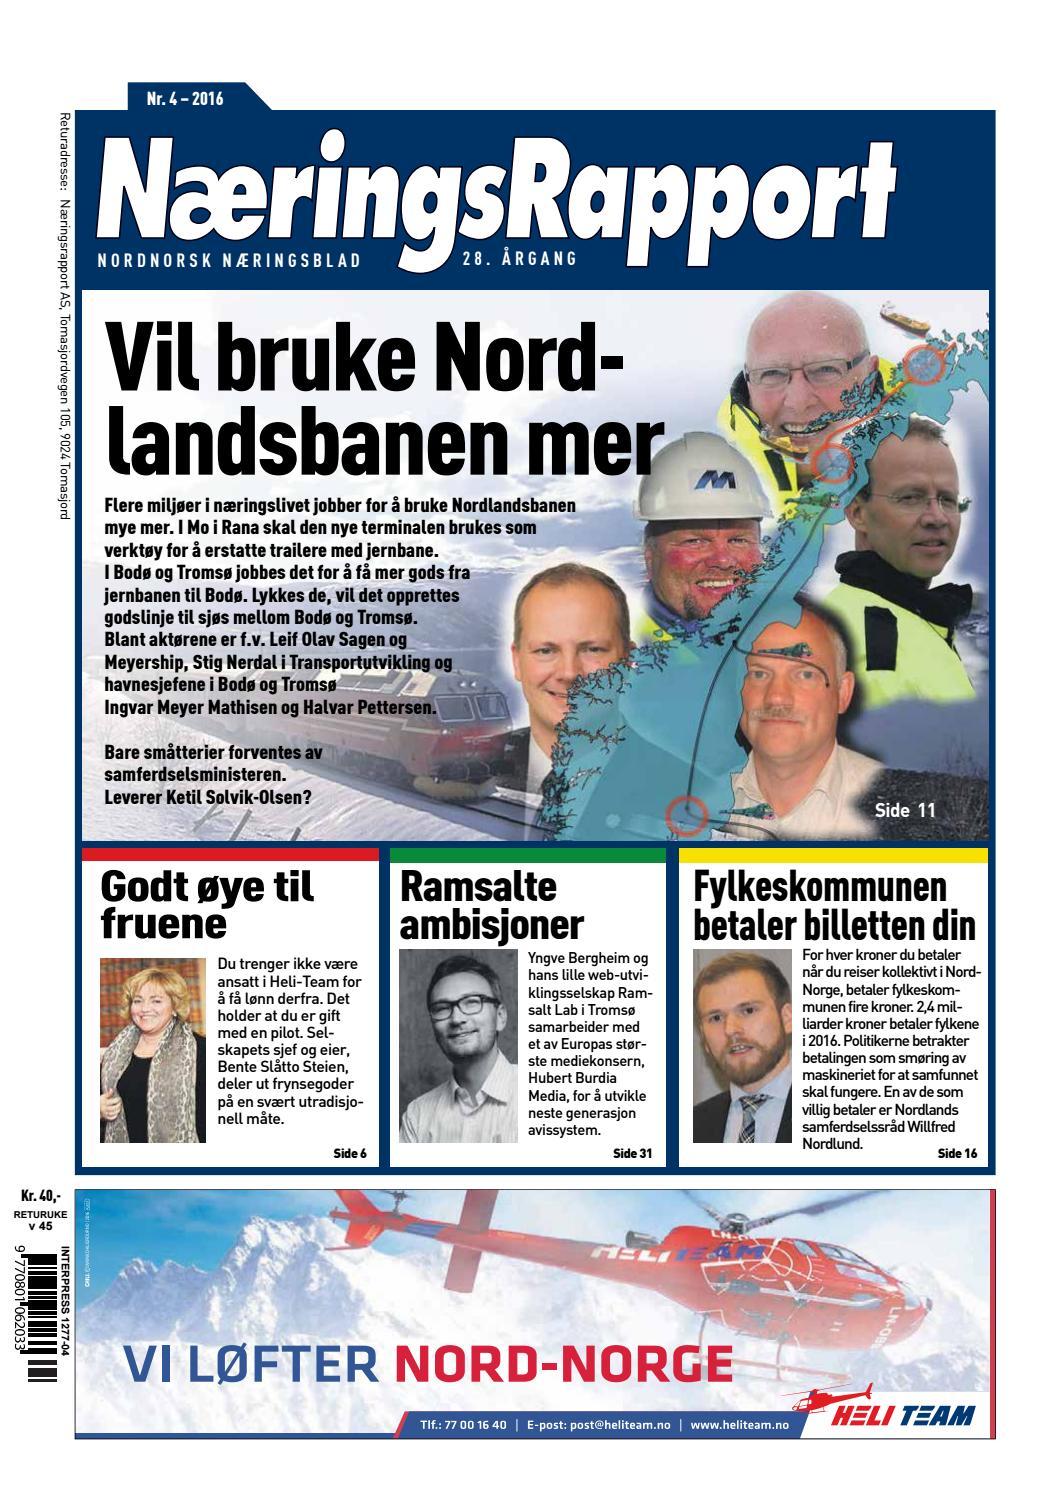 1f1a341c8fa7 NæringsRapport nr. 4 - 2016 by NæringsRapport - issuu